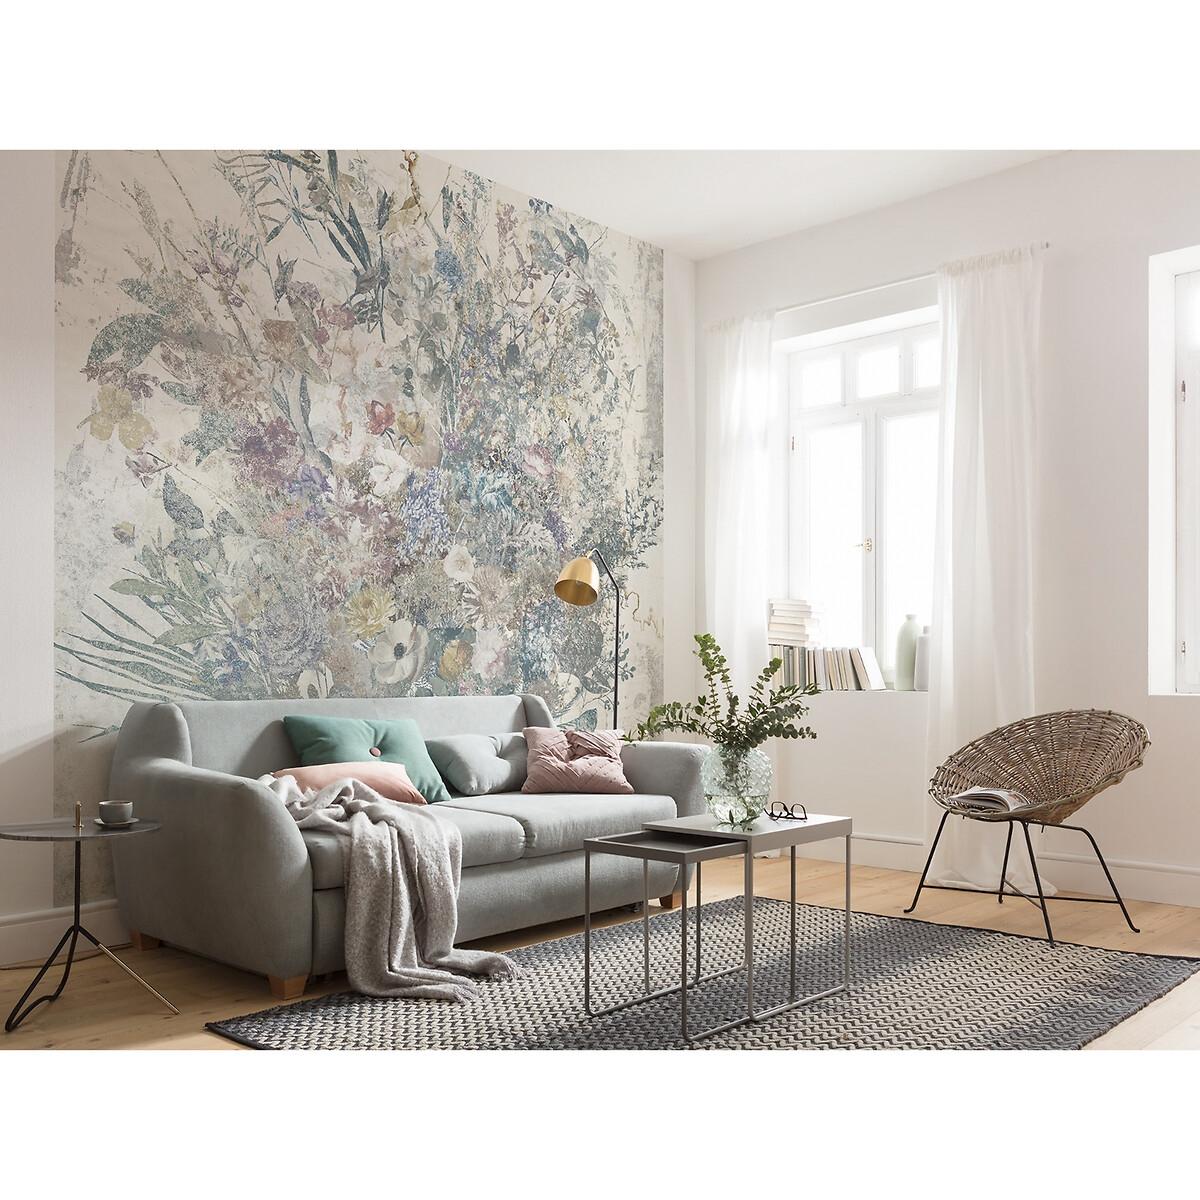 INTERELIFE - Interelife Papel de parede foto mural Bouquet Blowout, da Interelife